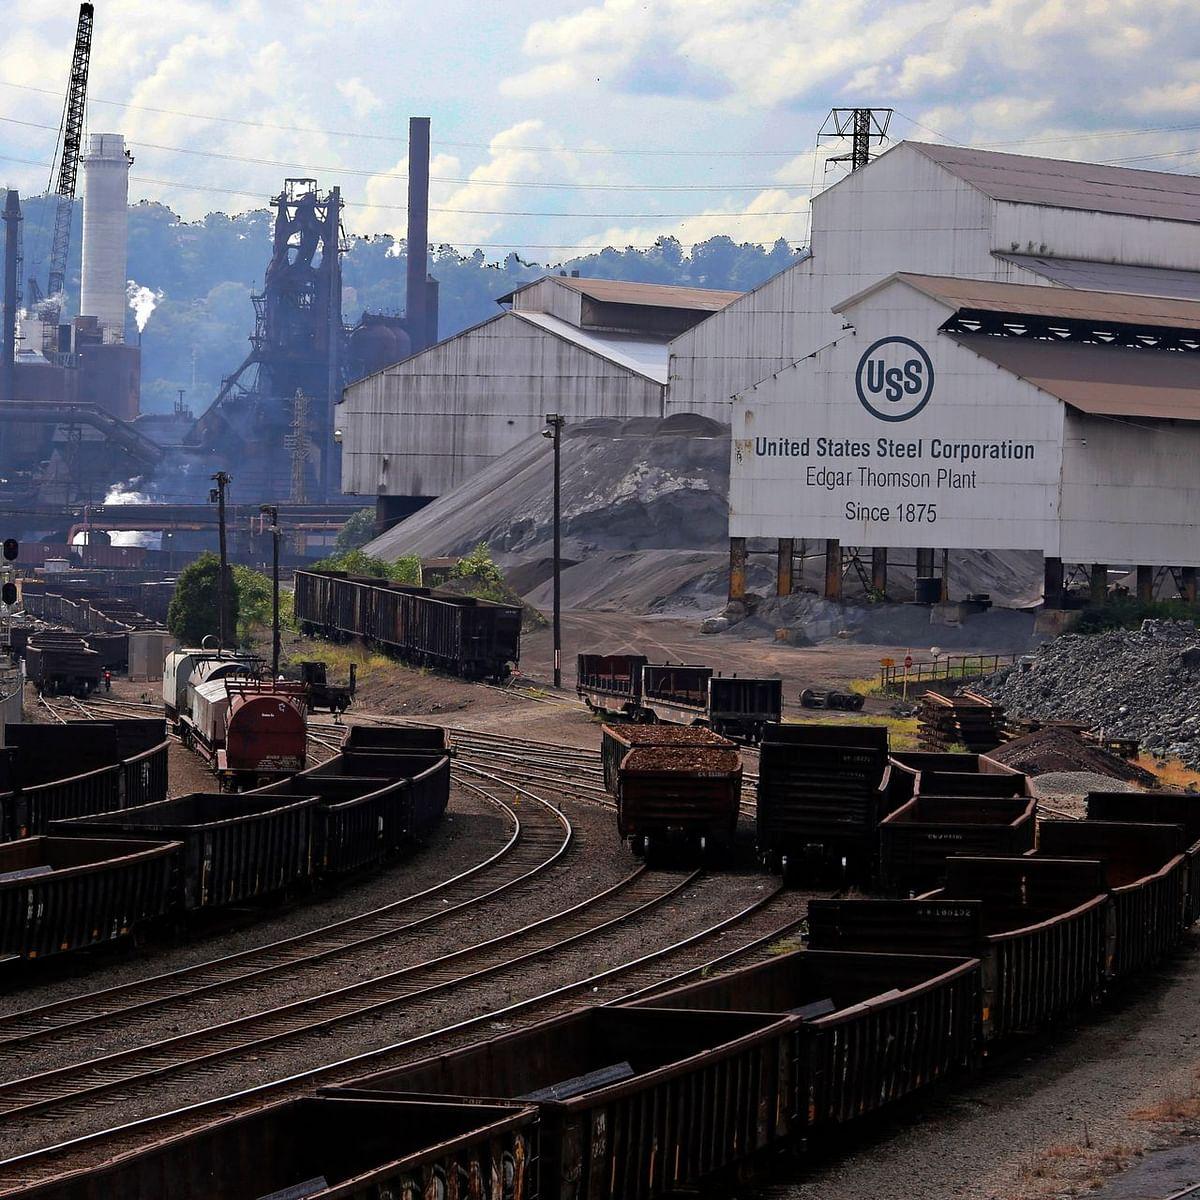 US Steel Sells Railway Assets of Transtar  Fortress Transportation